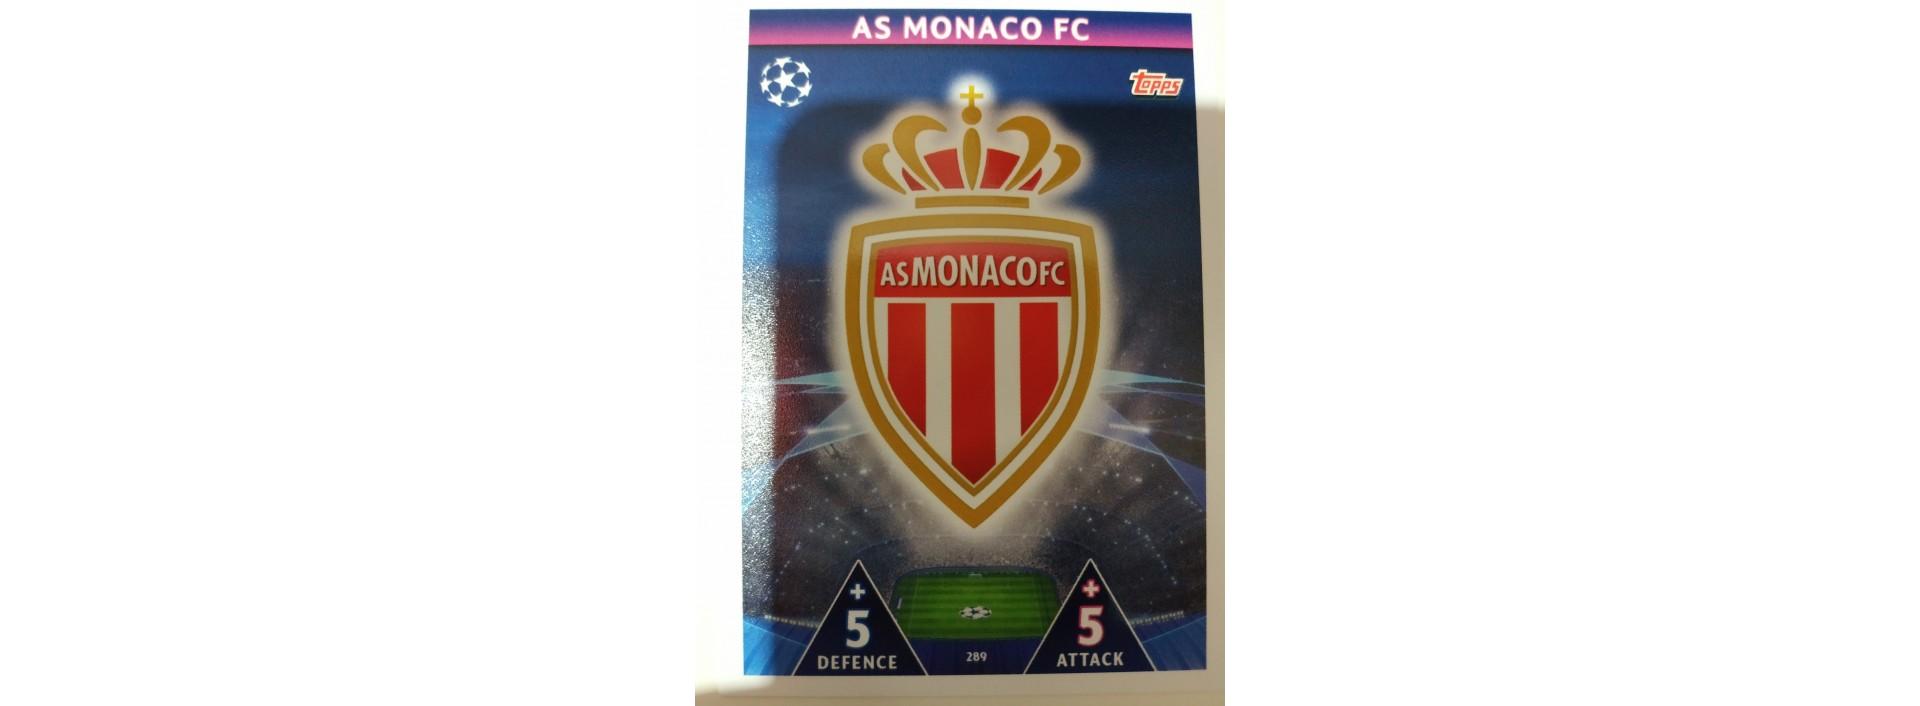 AS MONACO F.C.